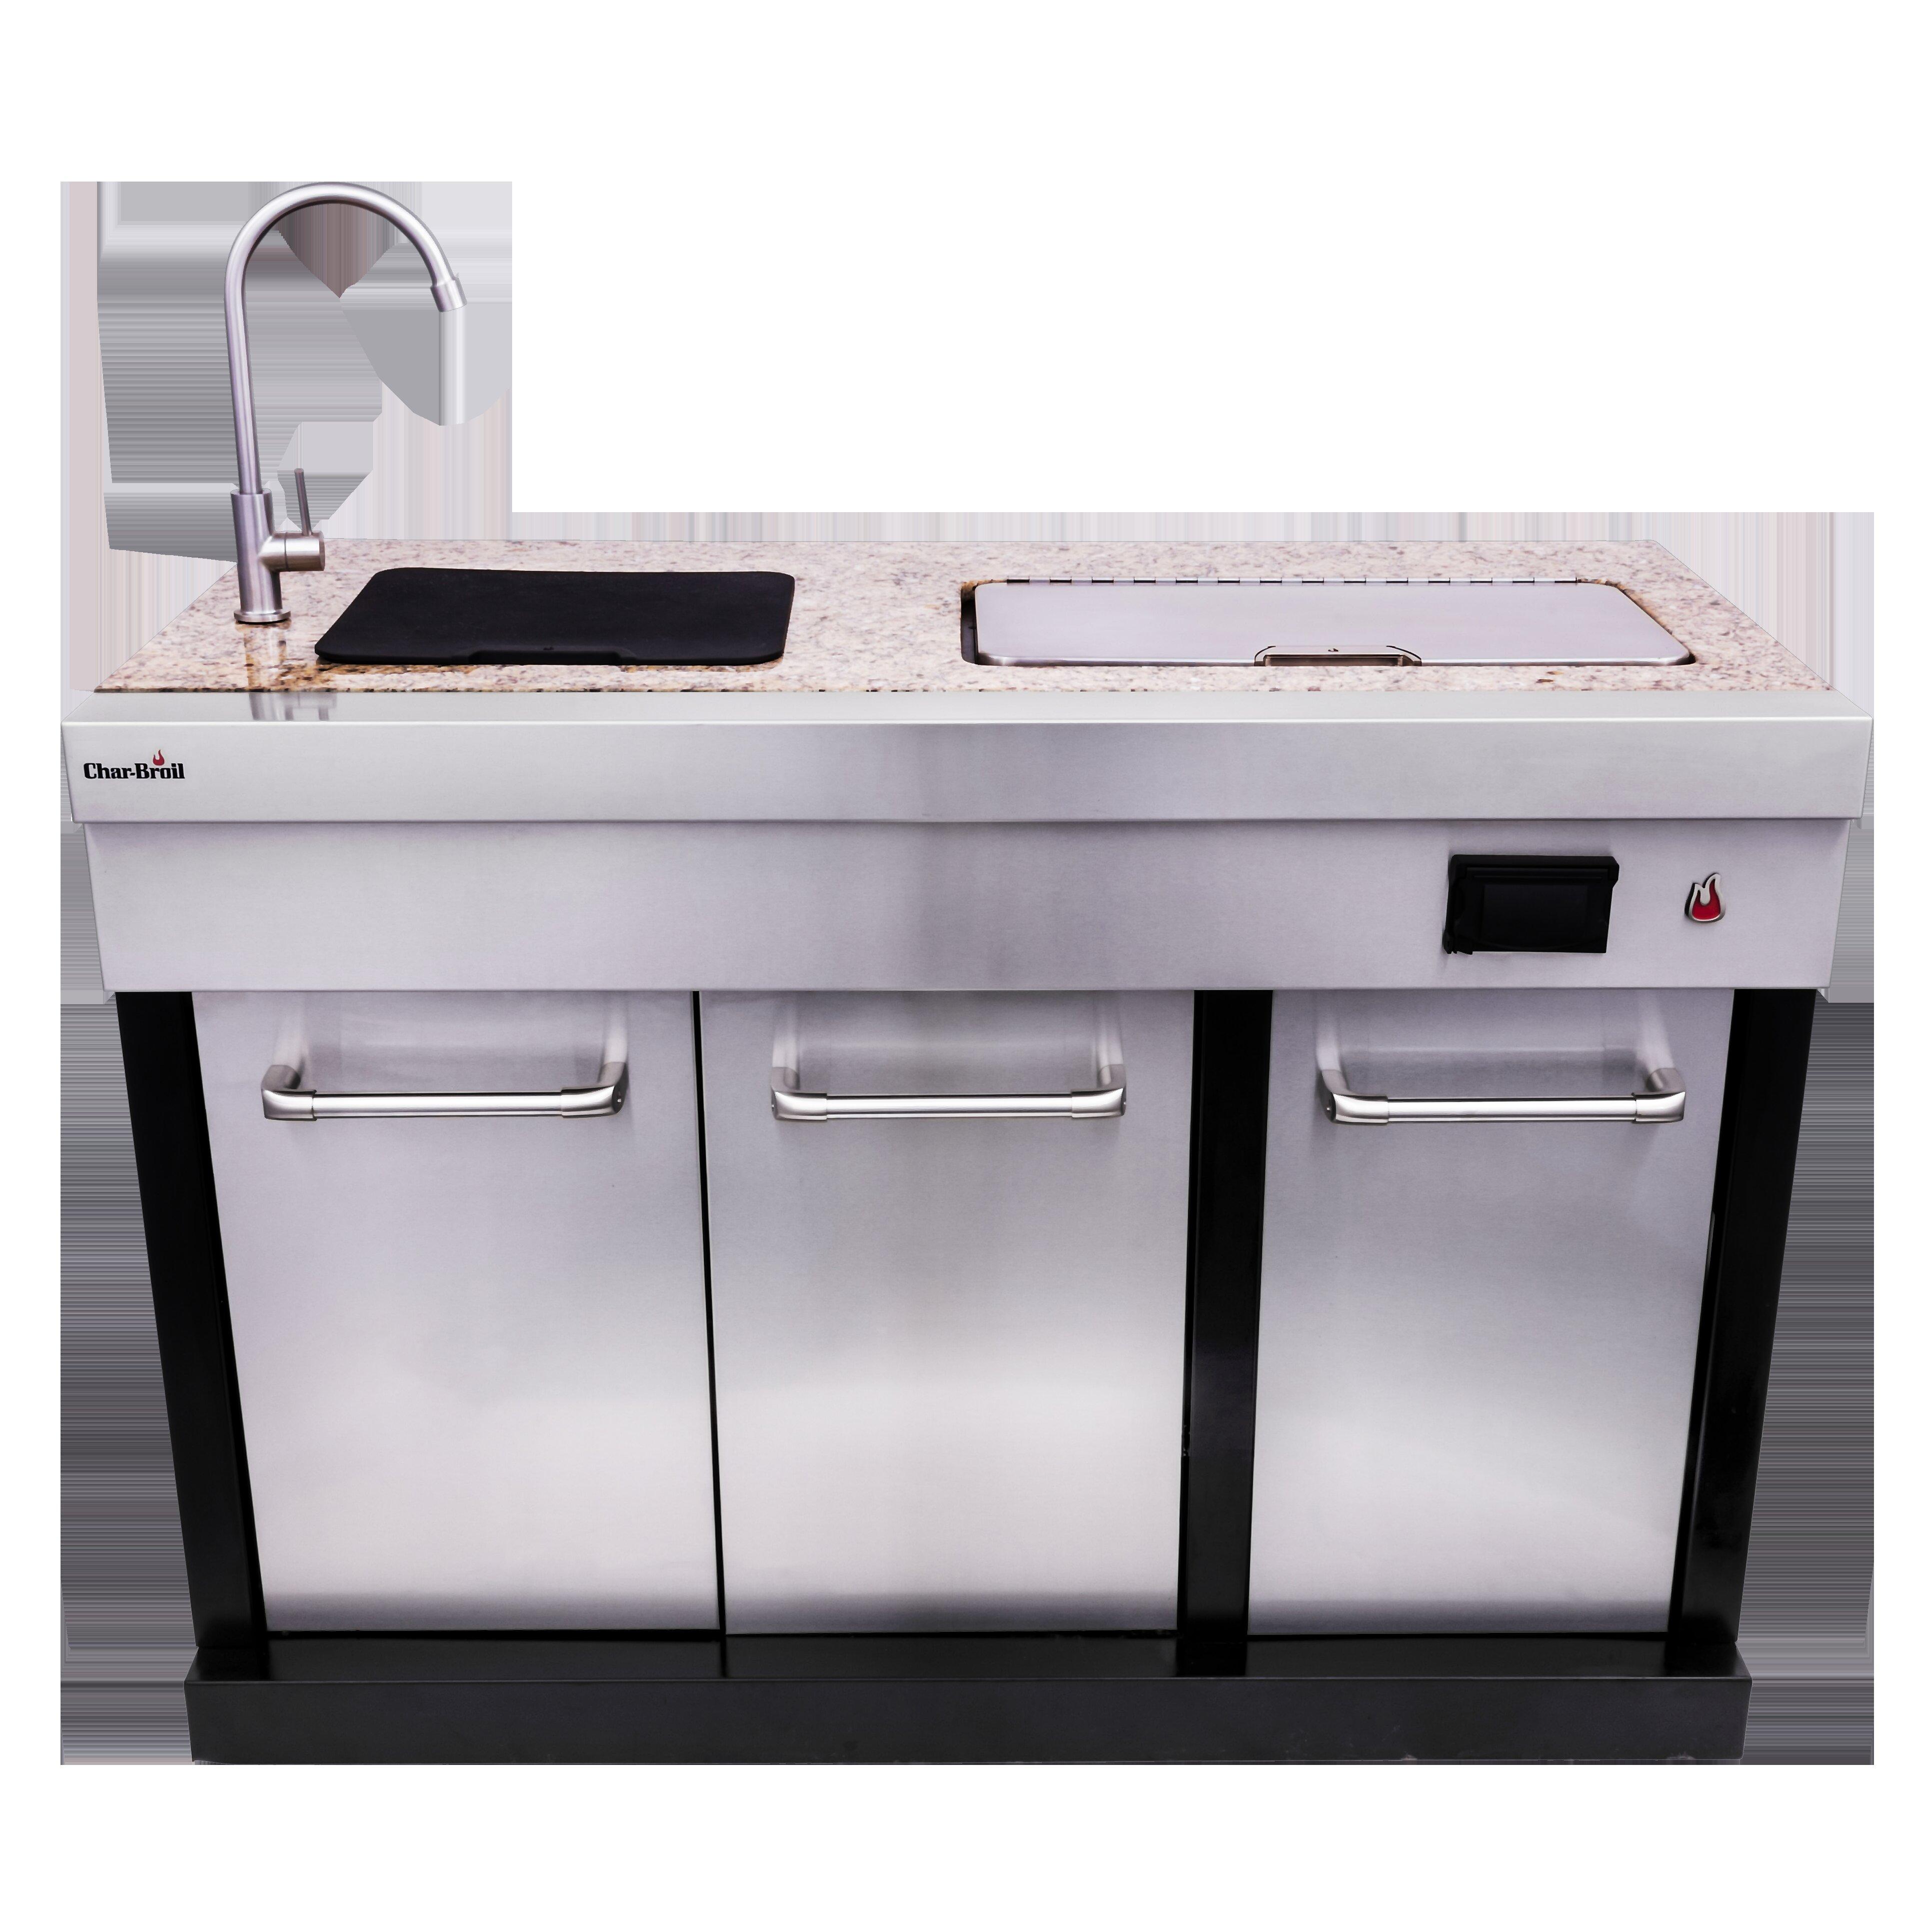 Charbroil Medallion Series Granite 50 Modular Outdoor Kitchen Cabinets Reviews Wayfair